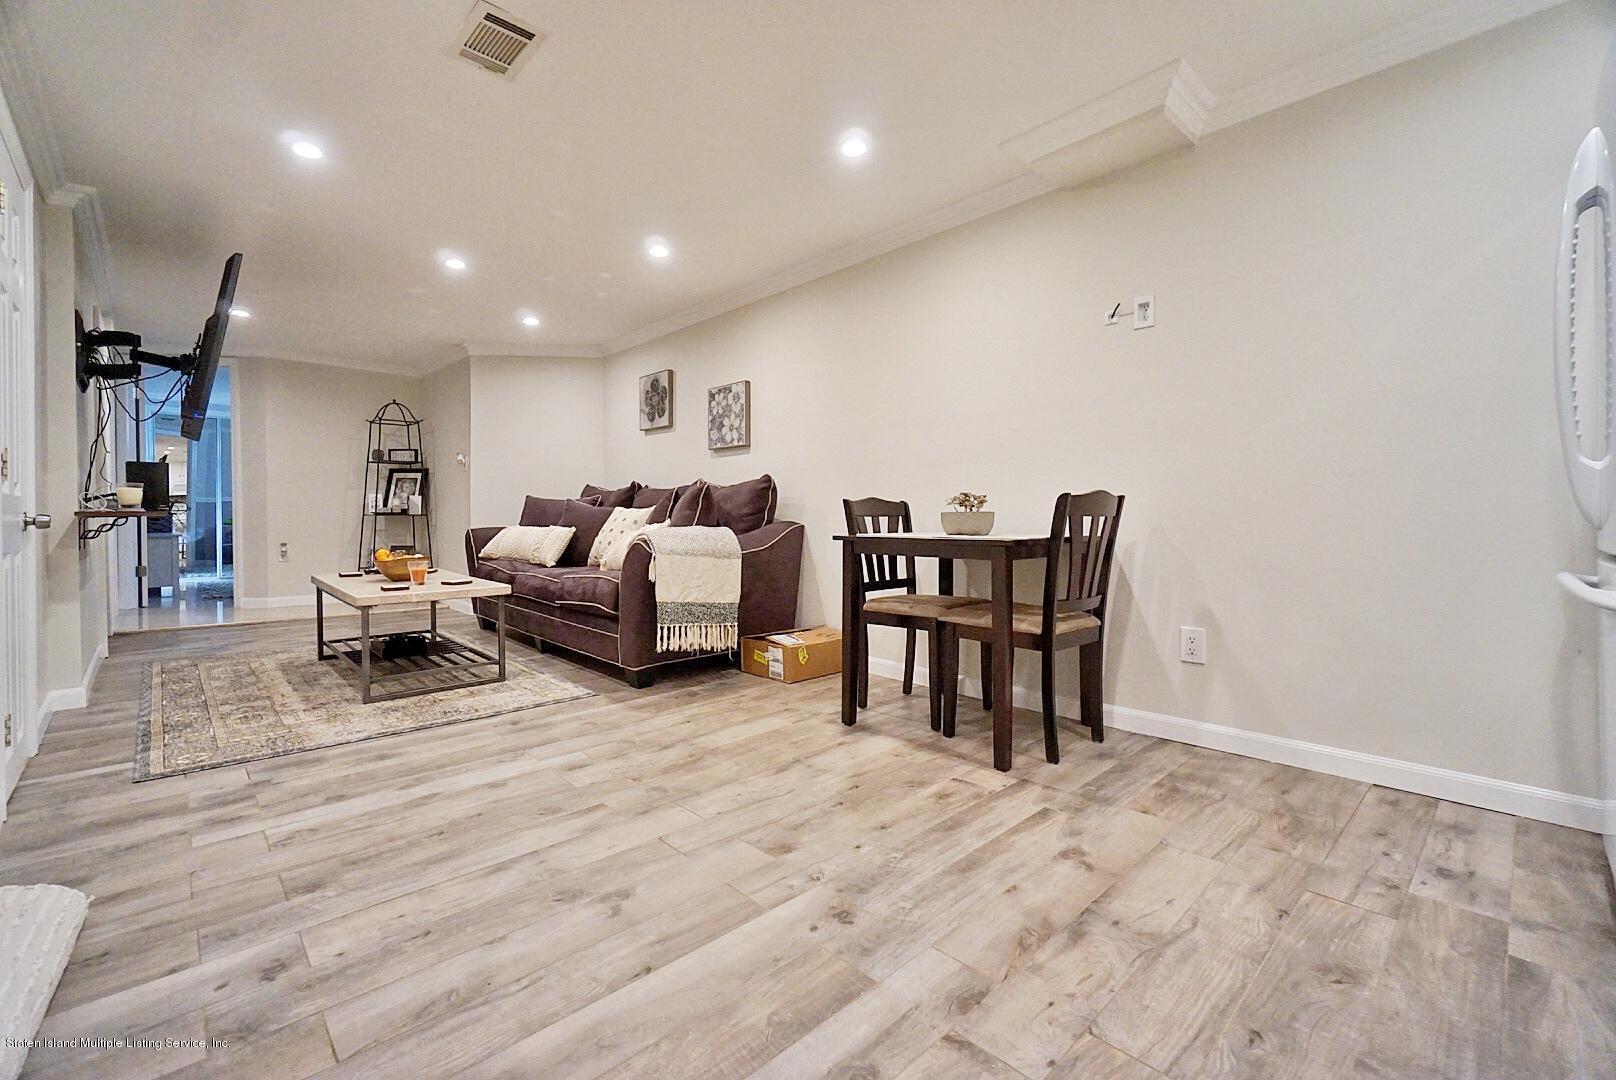 Single Family - Detached 67 Marvin Road  Staten Island, NY 10309, MLS-1128691-26